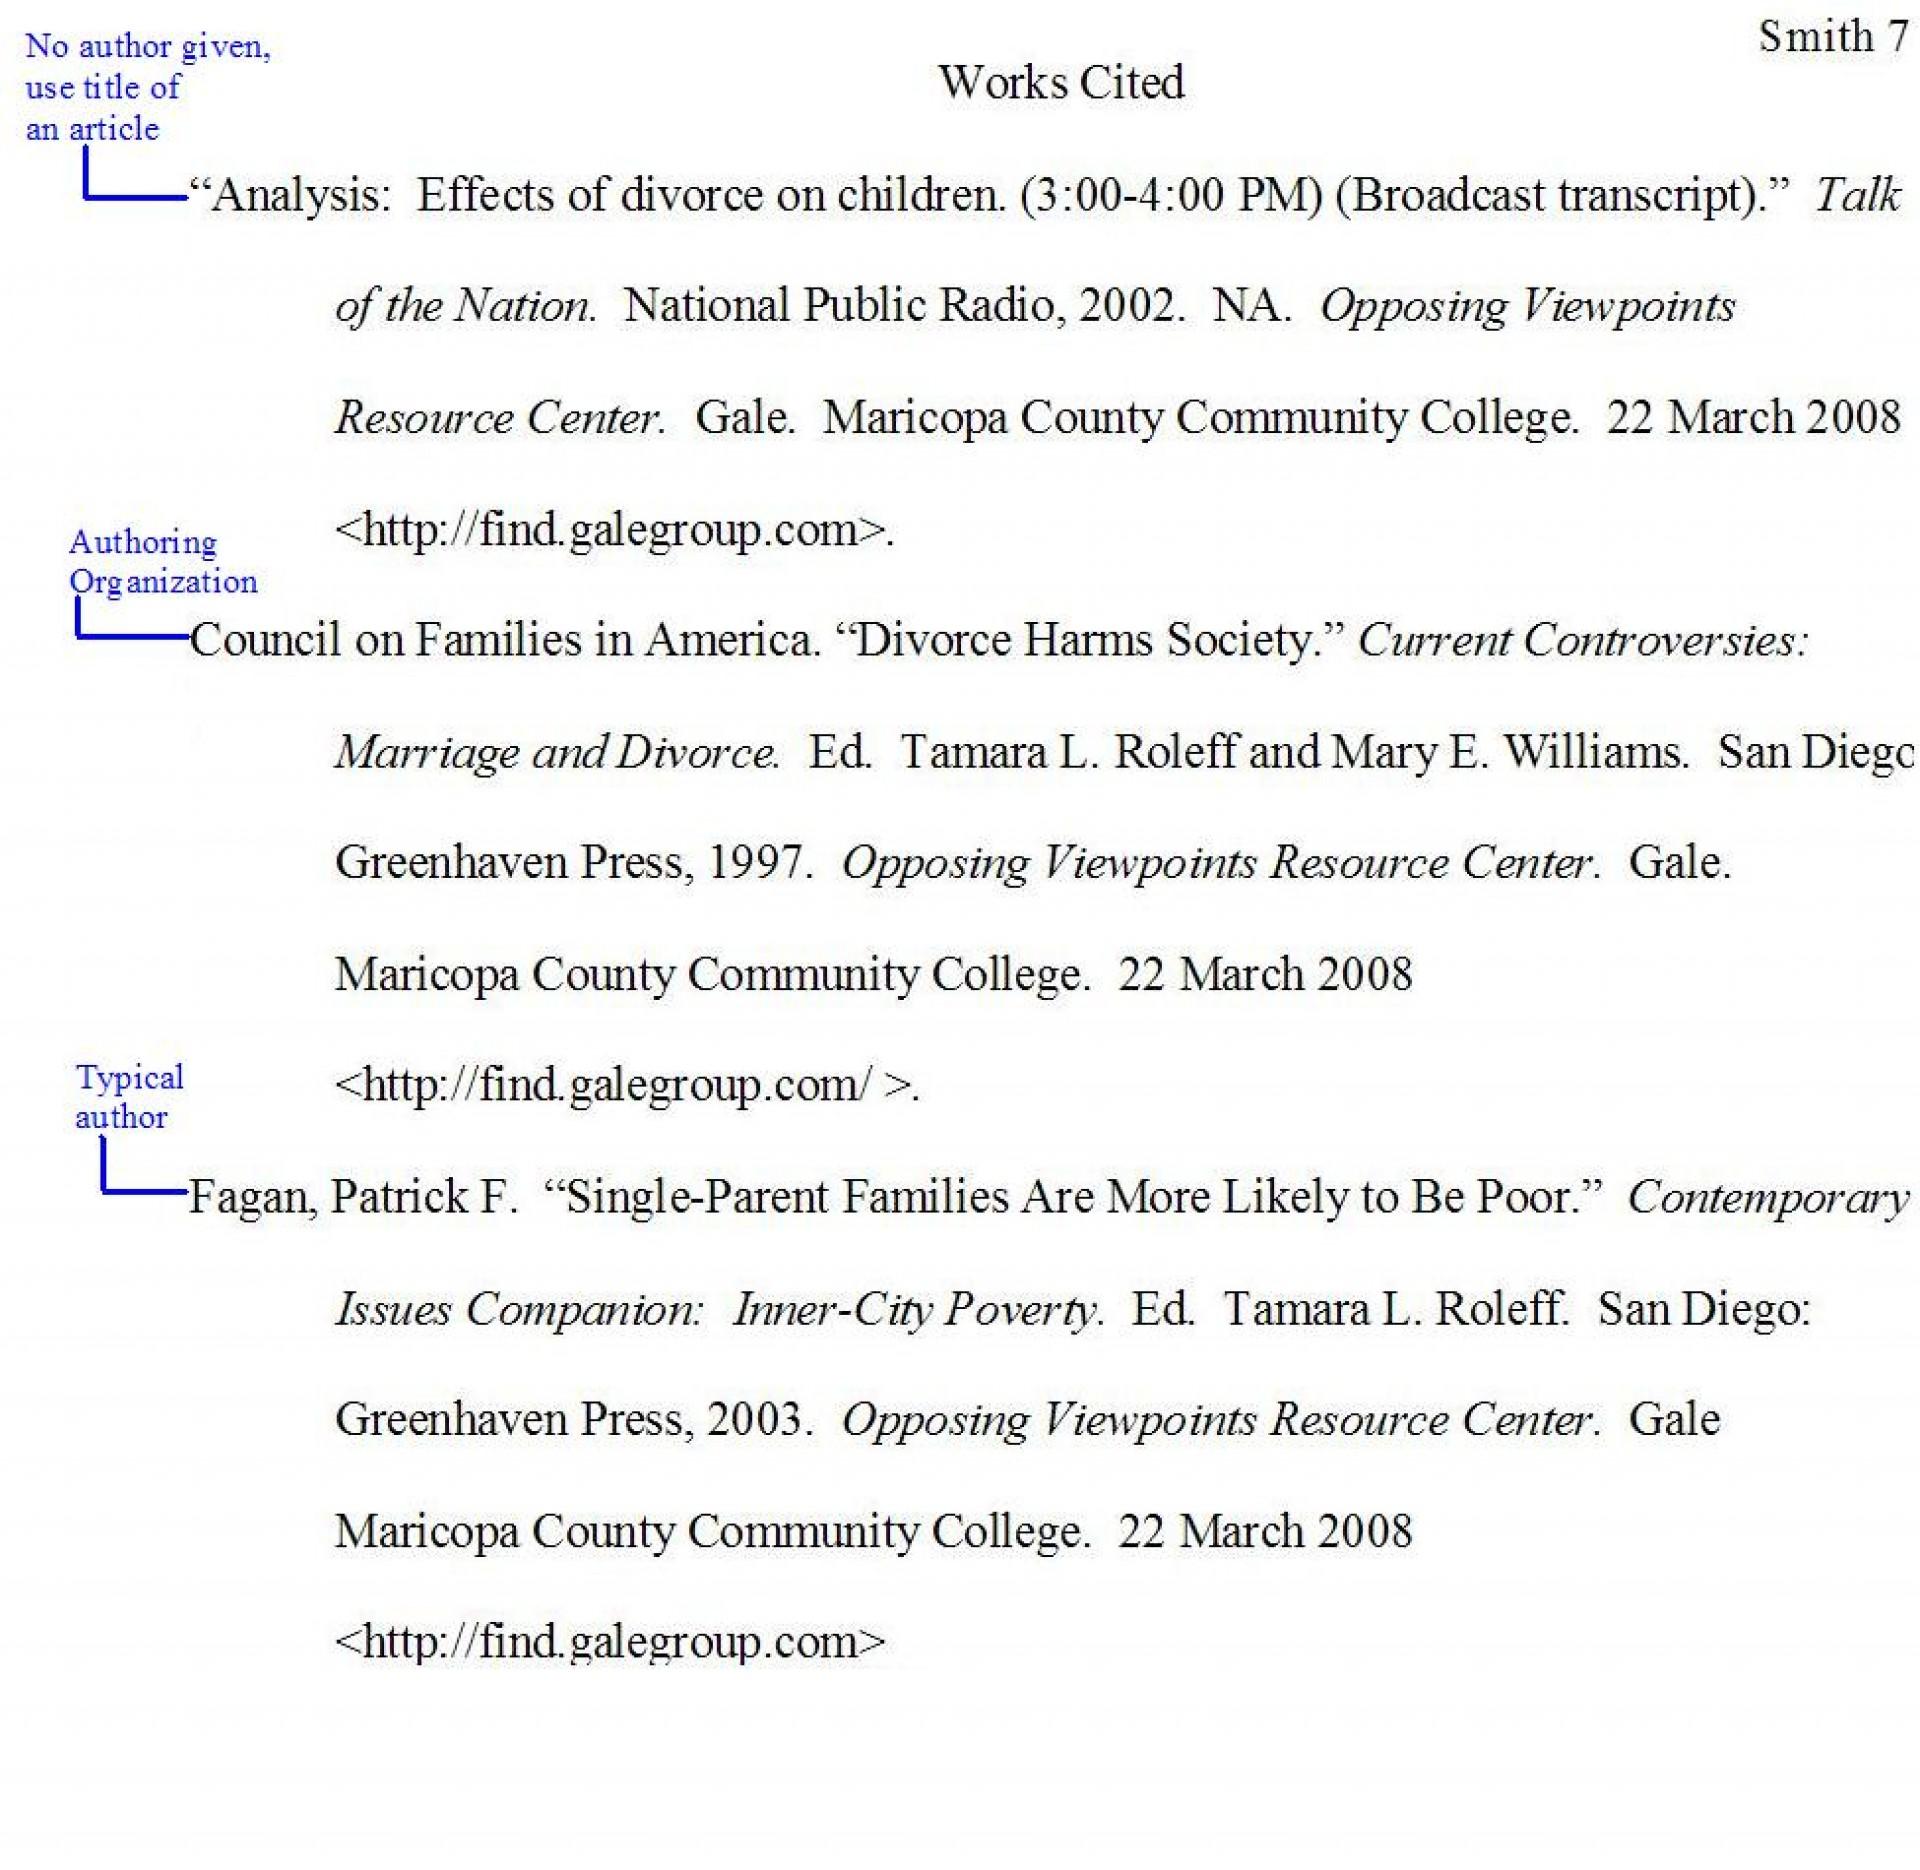 007 Fix My Essay Example Samplewrkctd Singular College Generator Free Help 1920